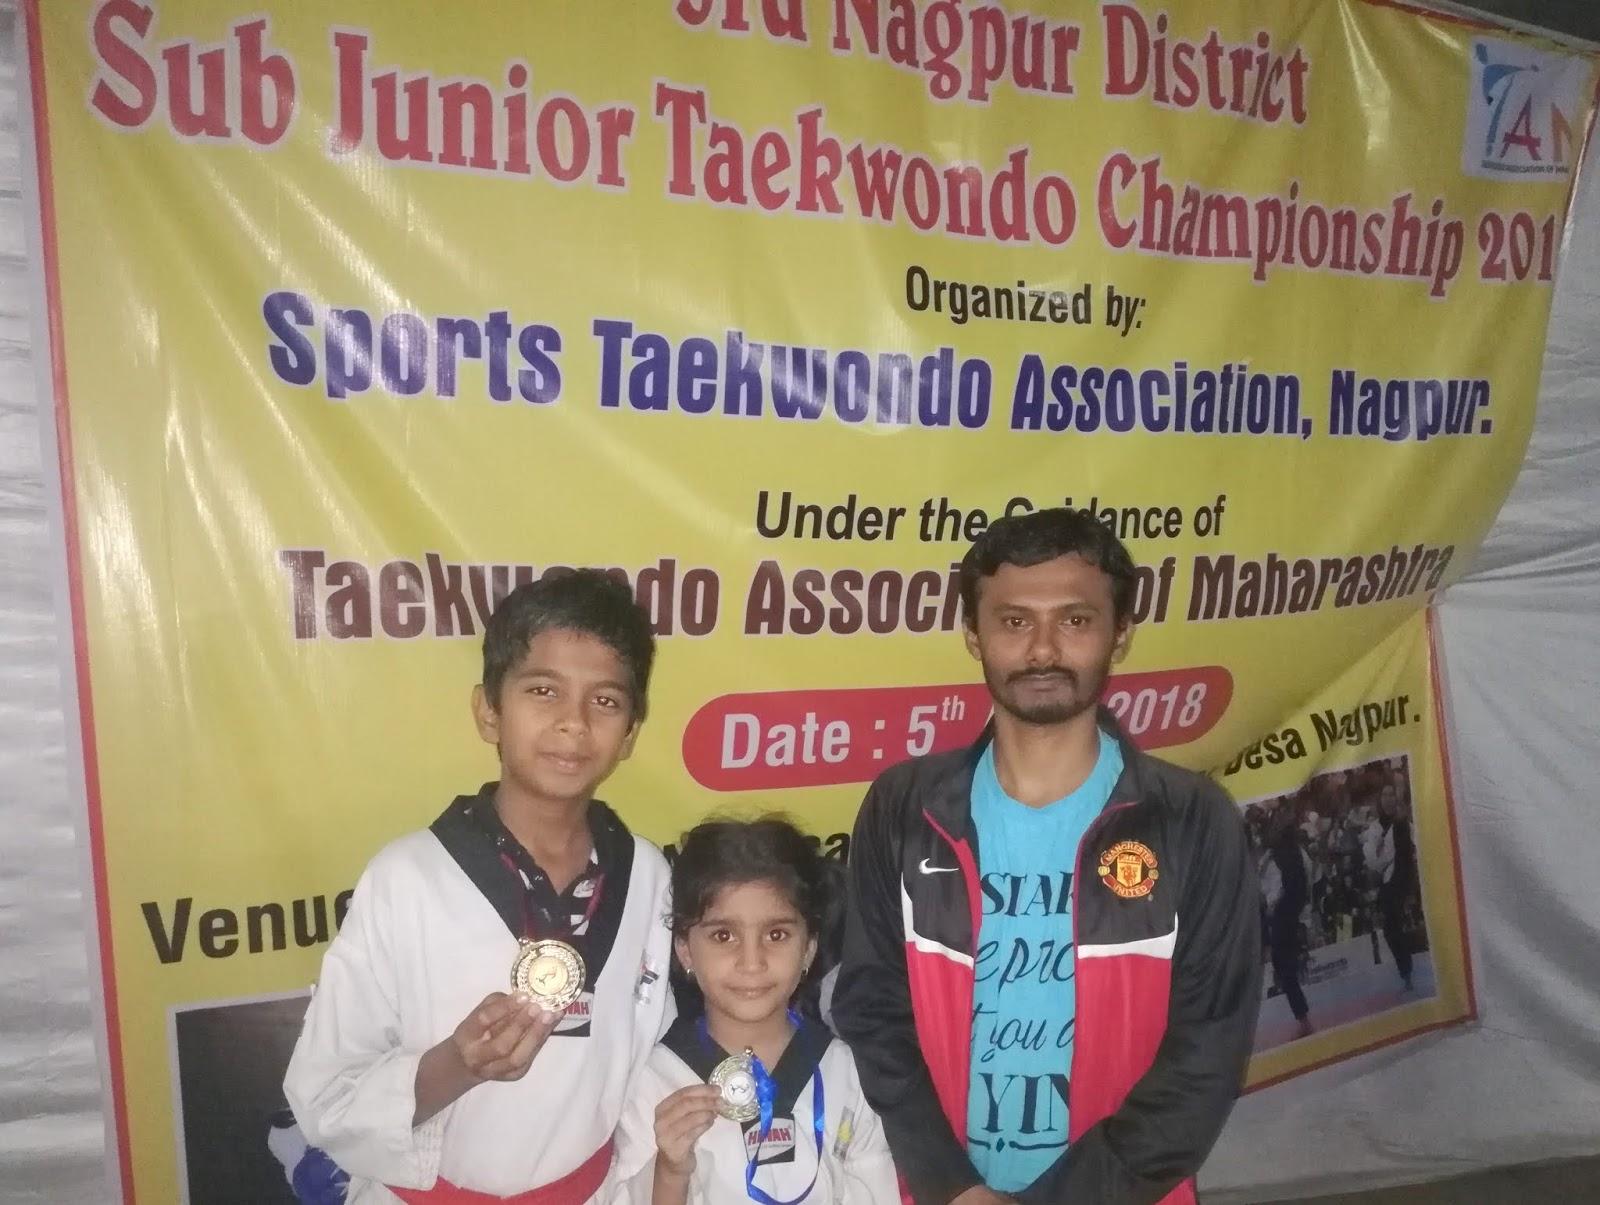 3Rd Sub Junior Taekwondo Championship 2018, NAGPUR.